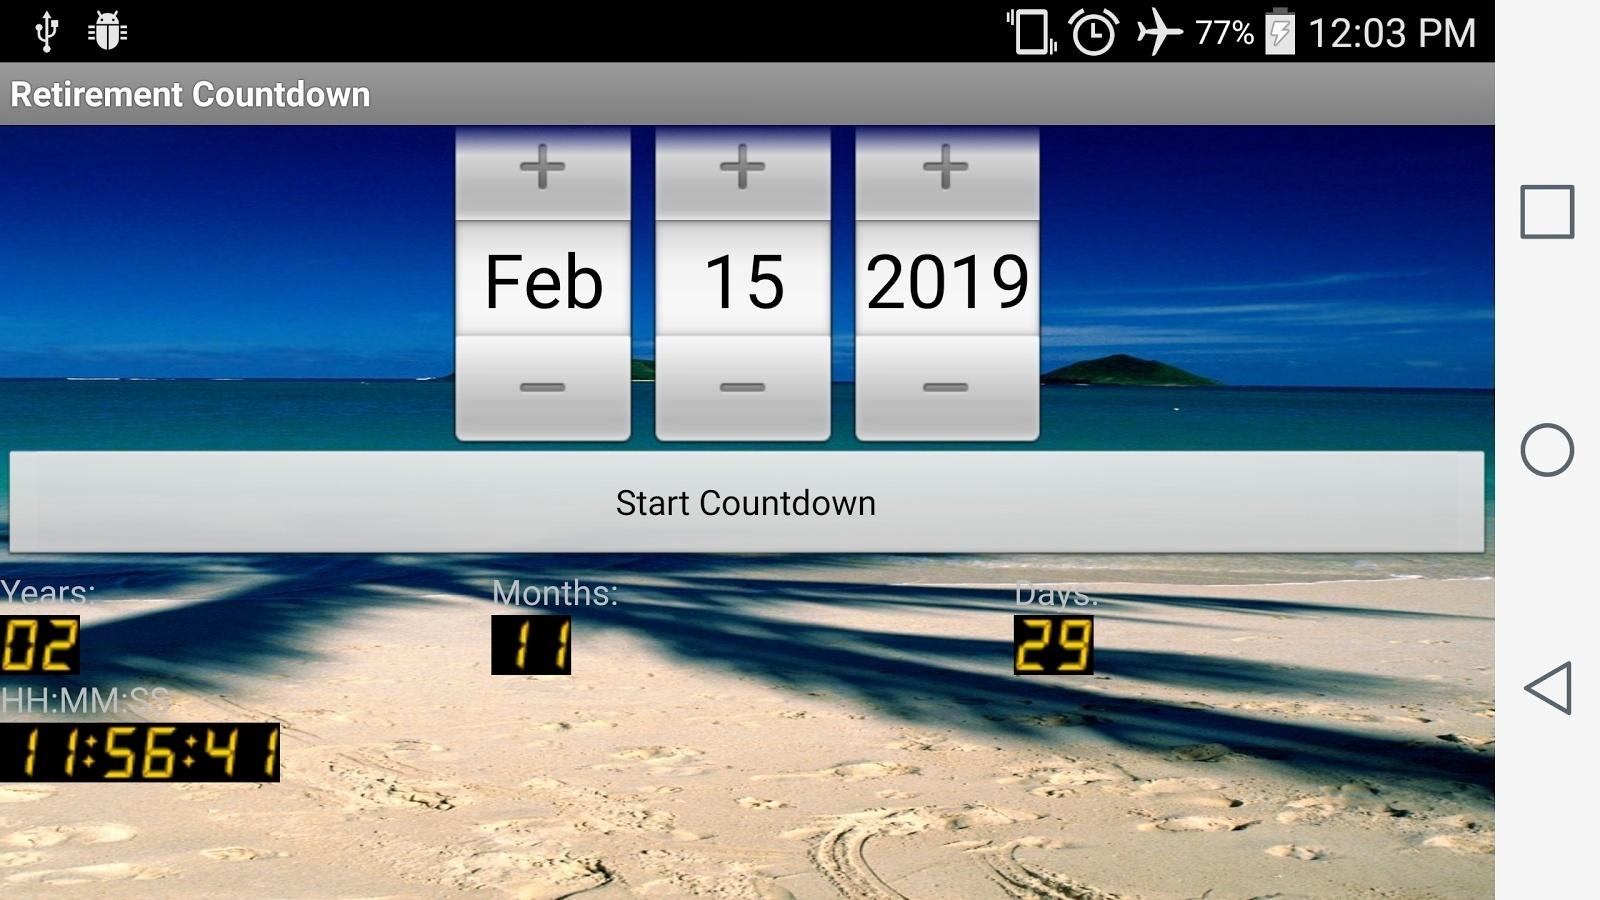 Calendar Countdown For Desktop • Printable Blank Calendar Template_Countdown Calendar To Retirement Desktop